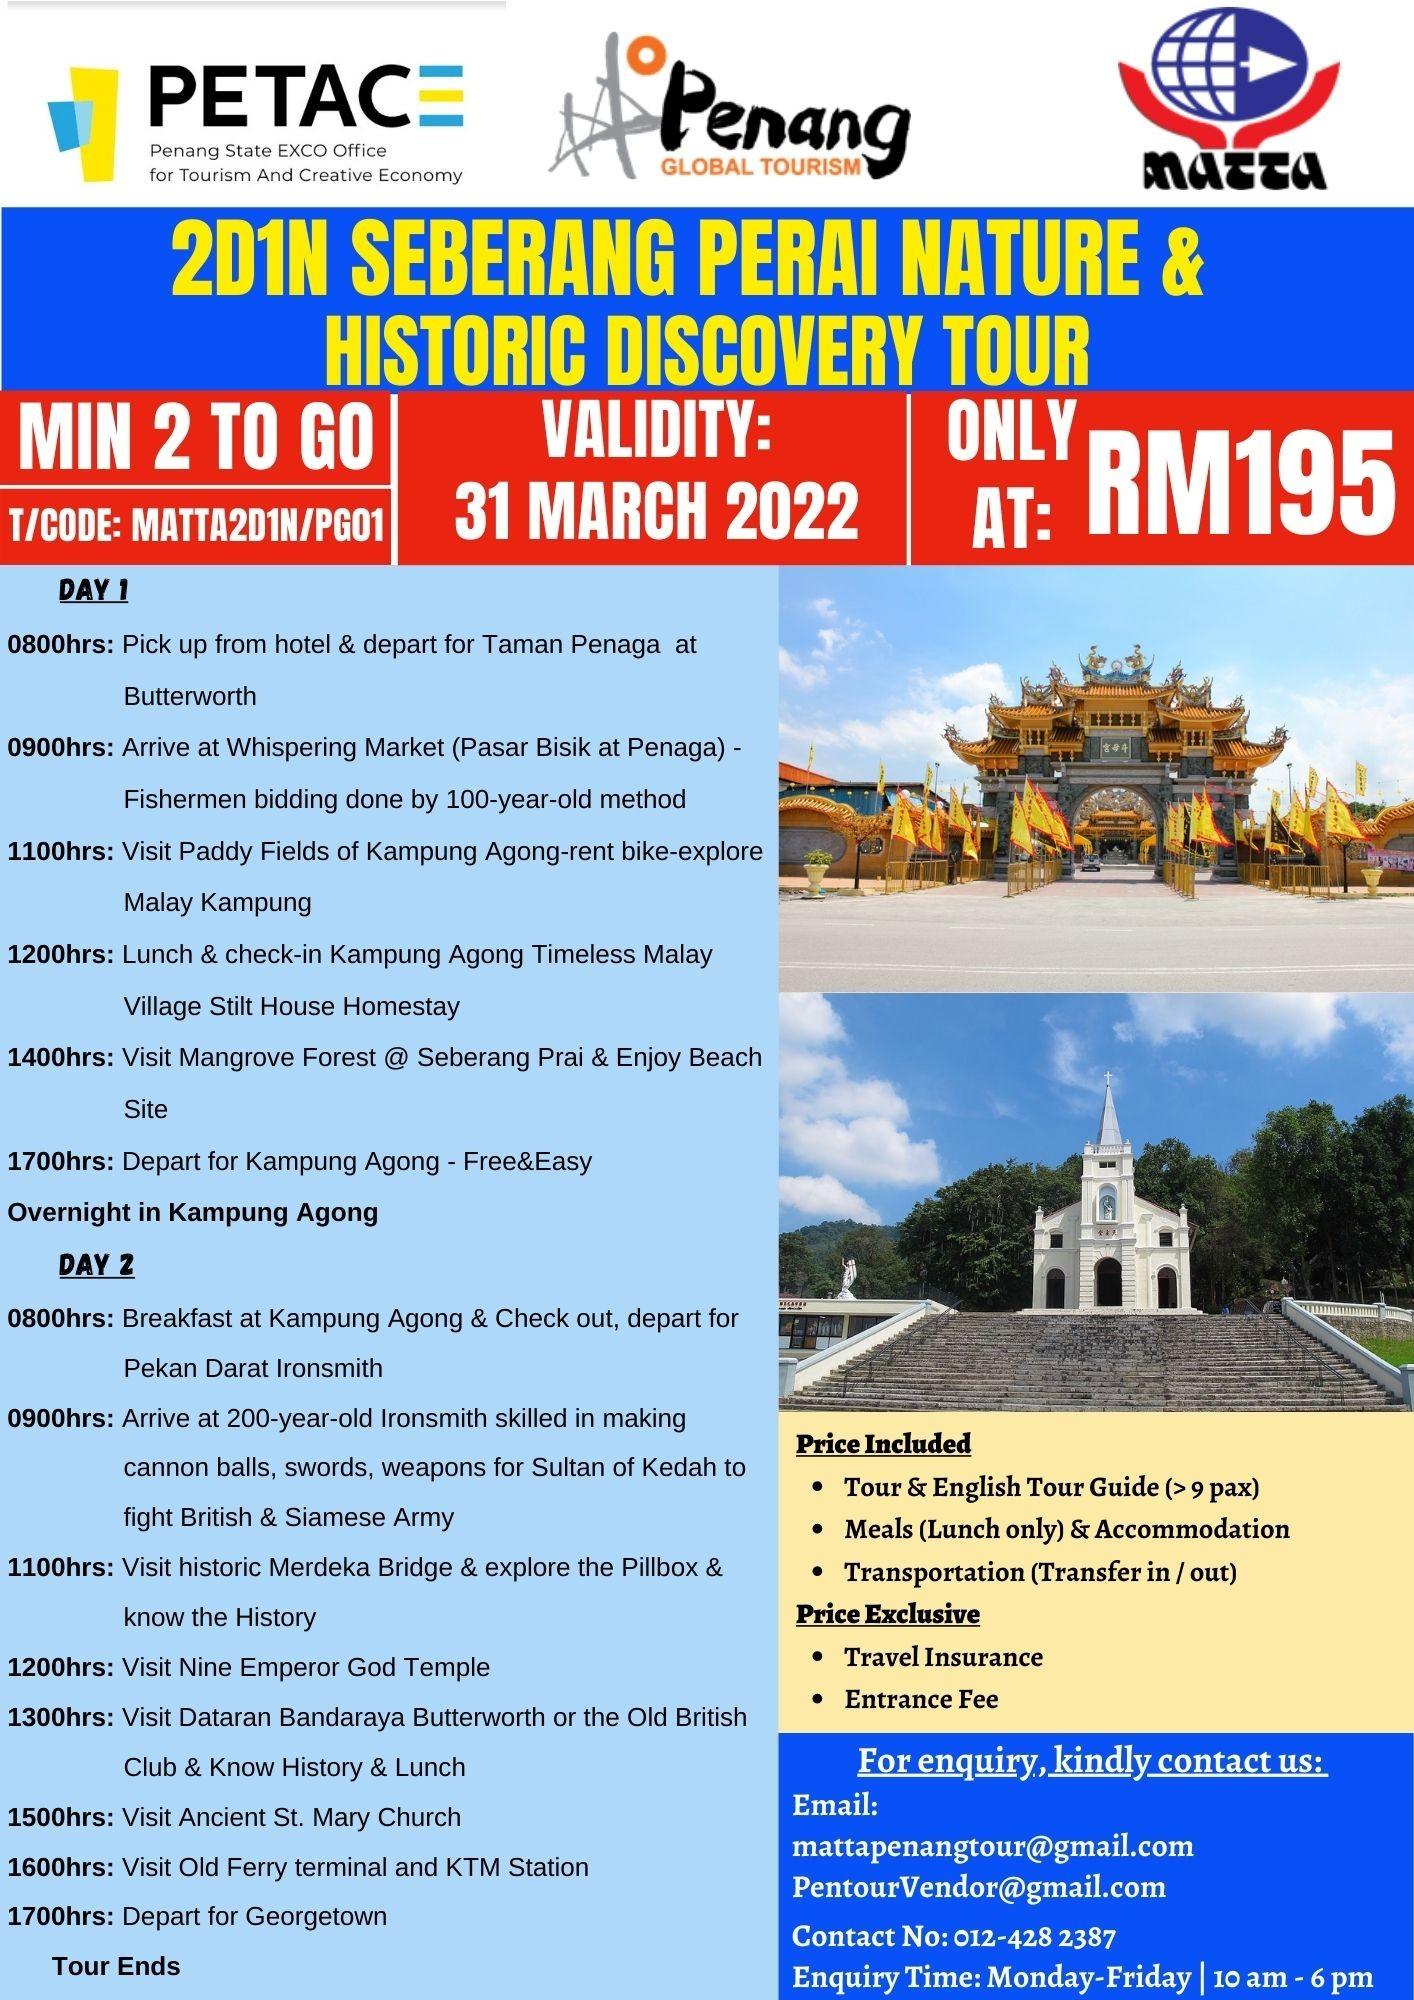 2D1N Seberang Perai Nature & Historic Discovery Tour